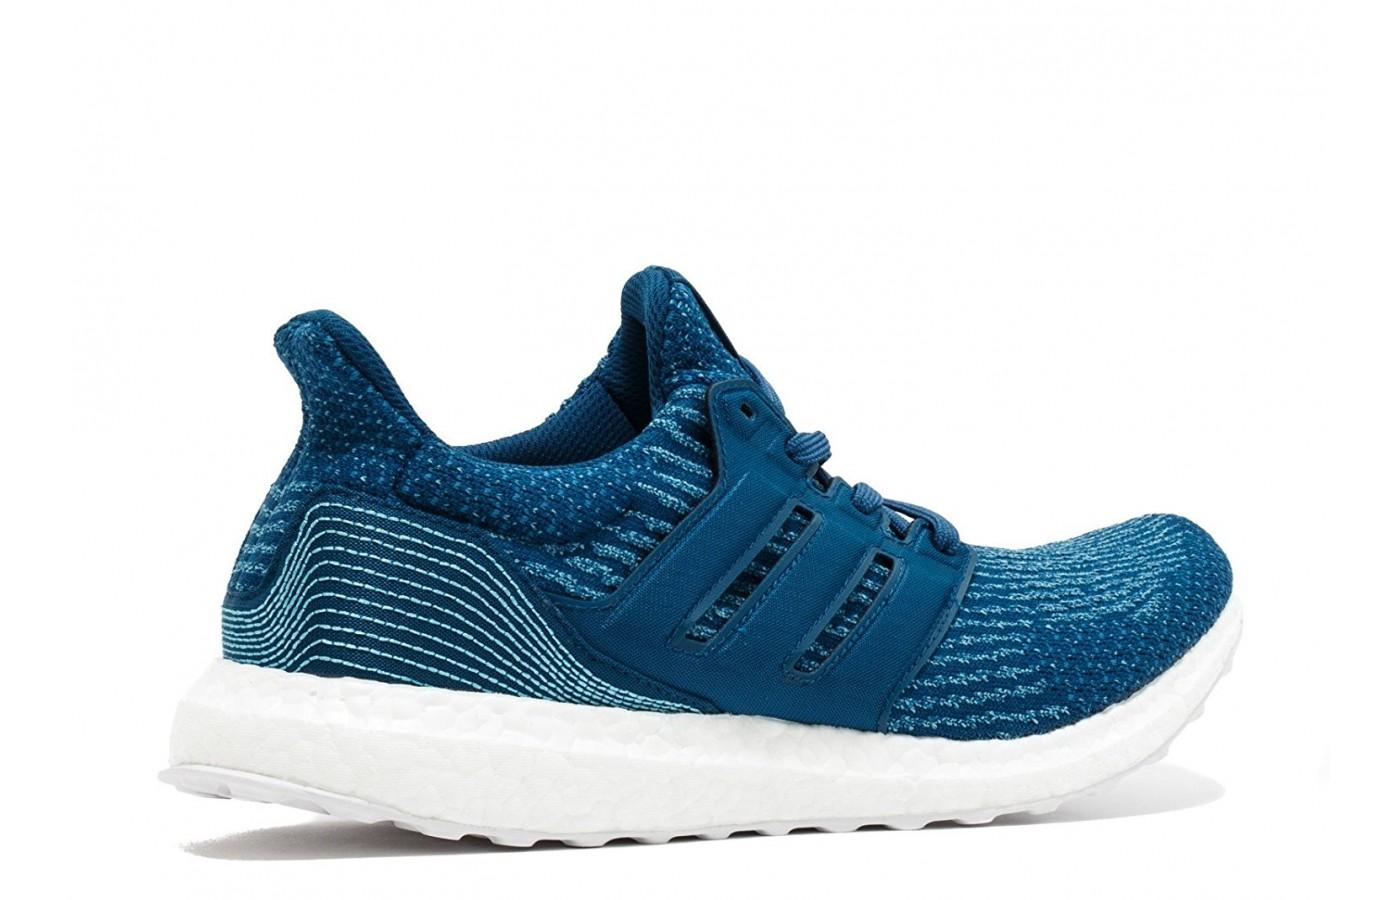 Adidas Parley heel